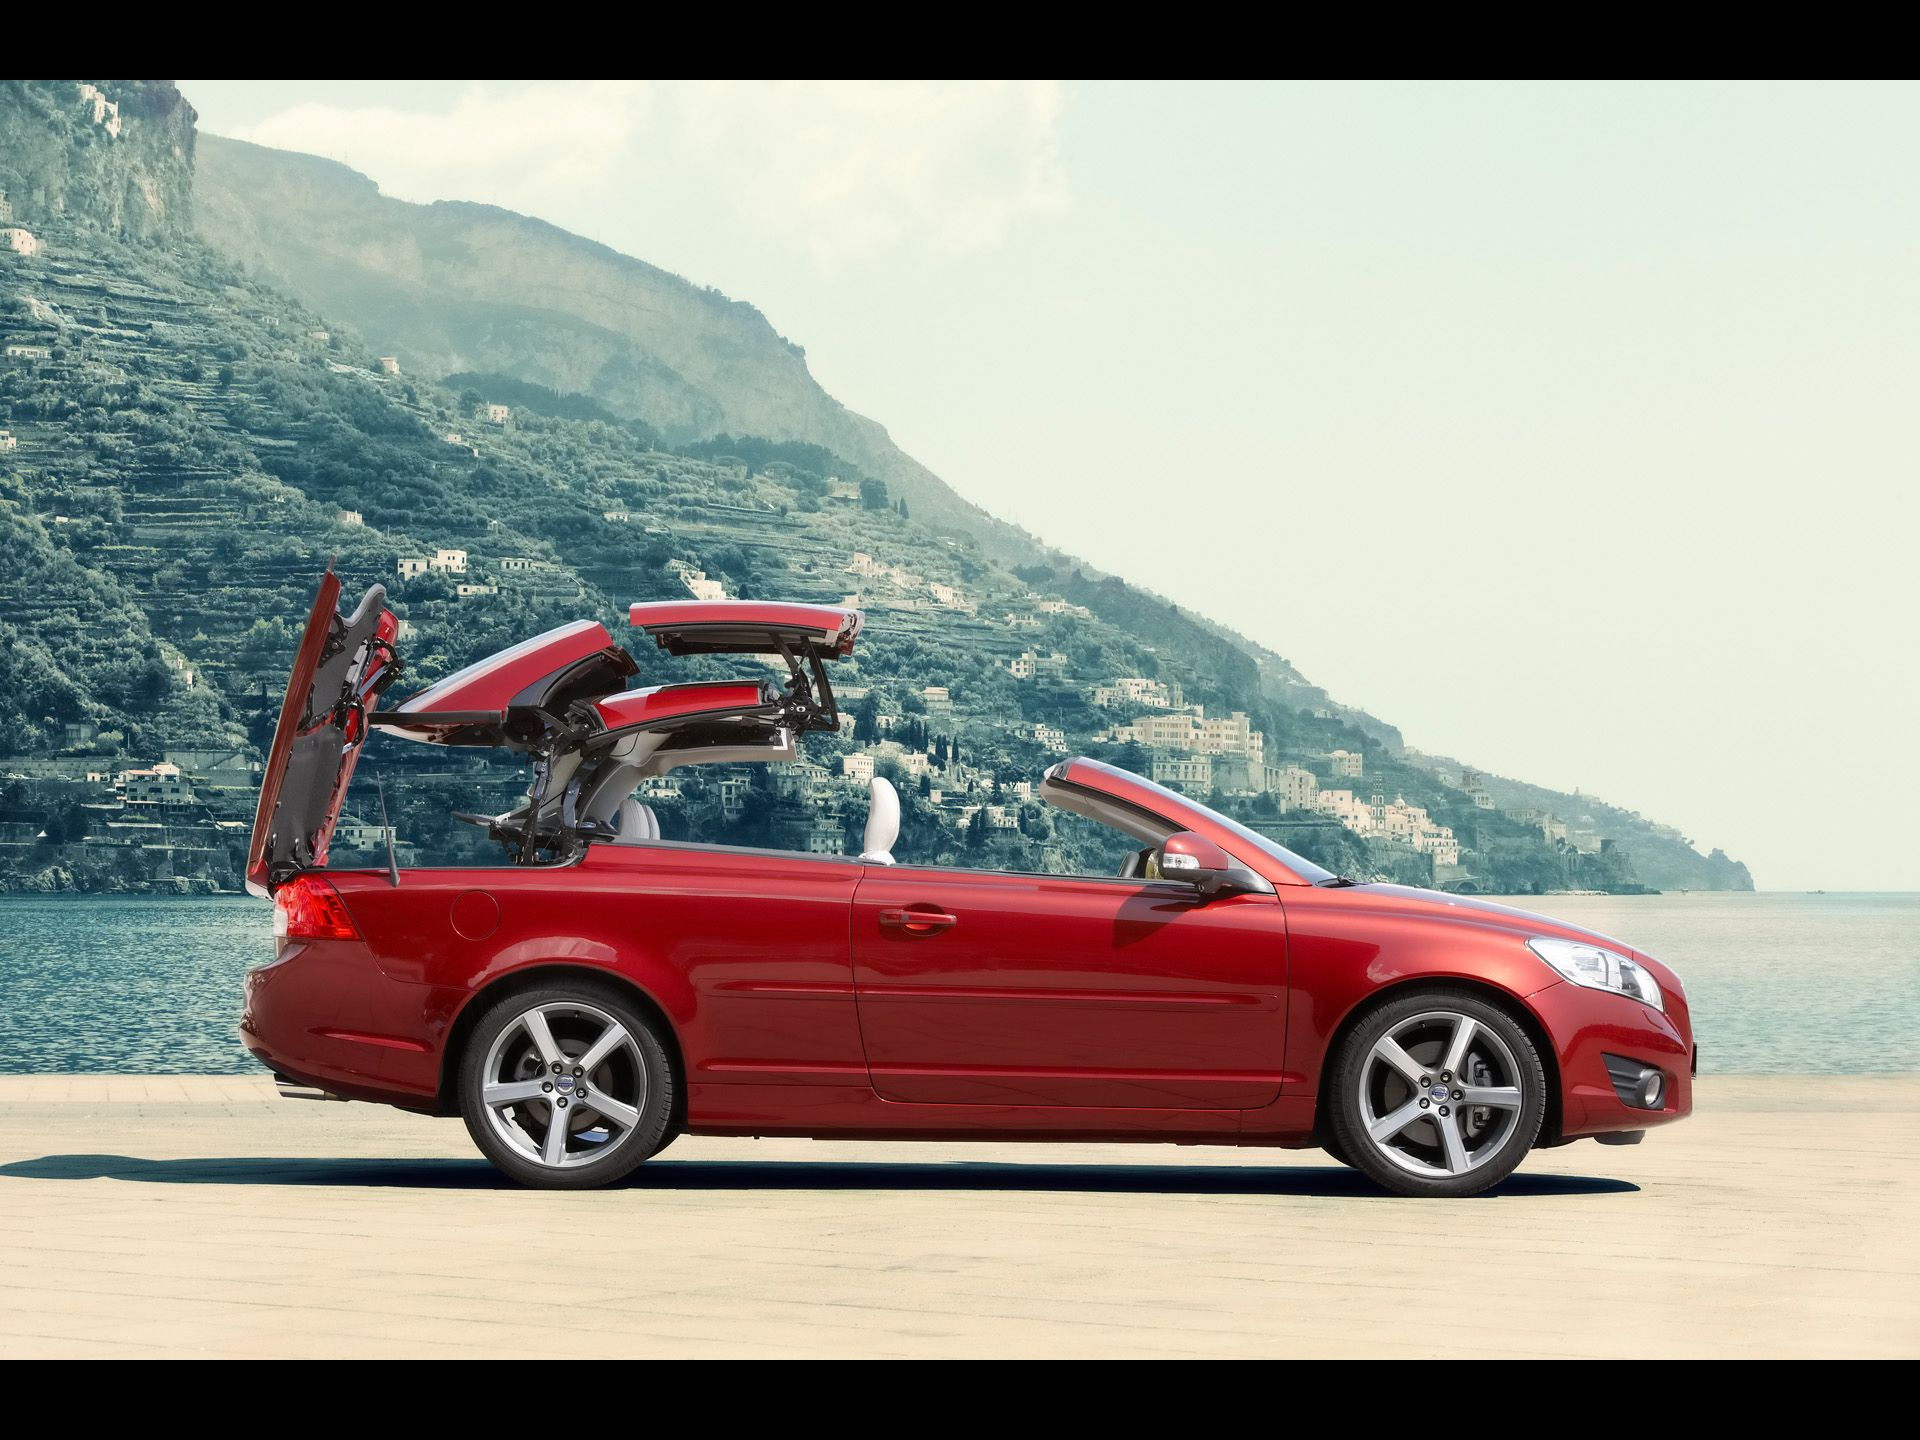 2010 Volvo C70 - Flaco Red Retractable Hardtop Folds Away ...